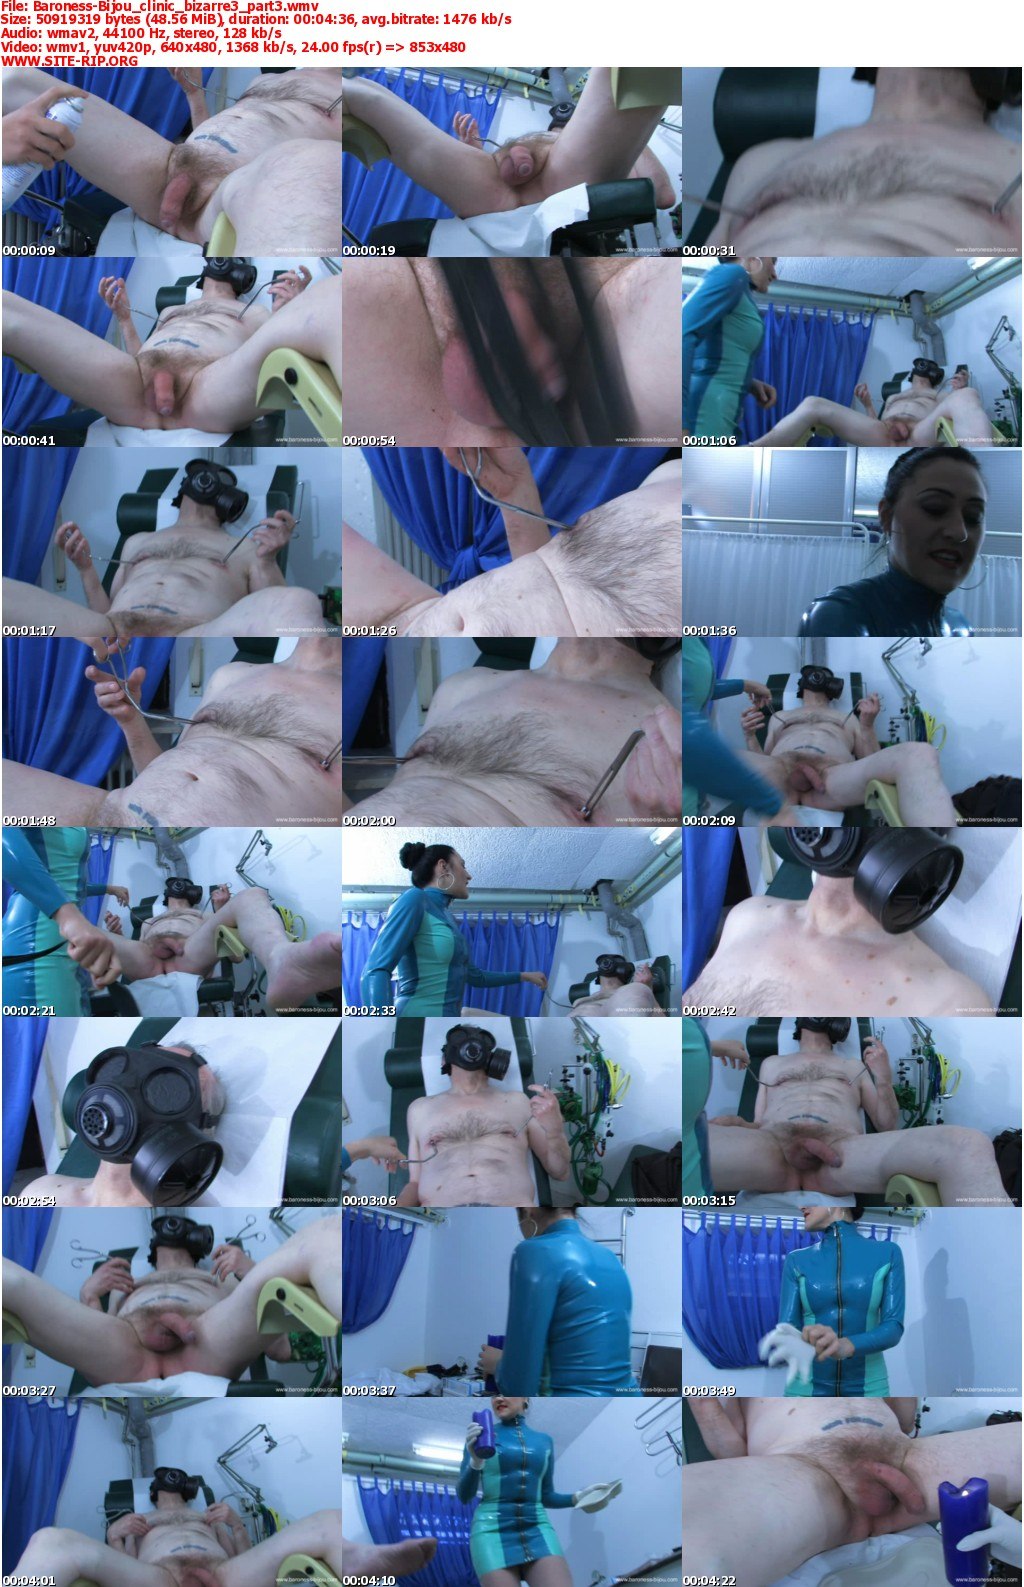 Baroness-Bijou_clinic_bizarre3_part3_s.jpg